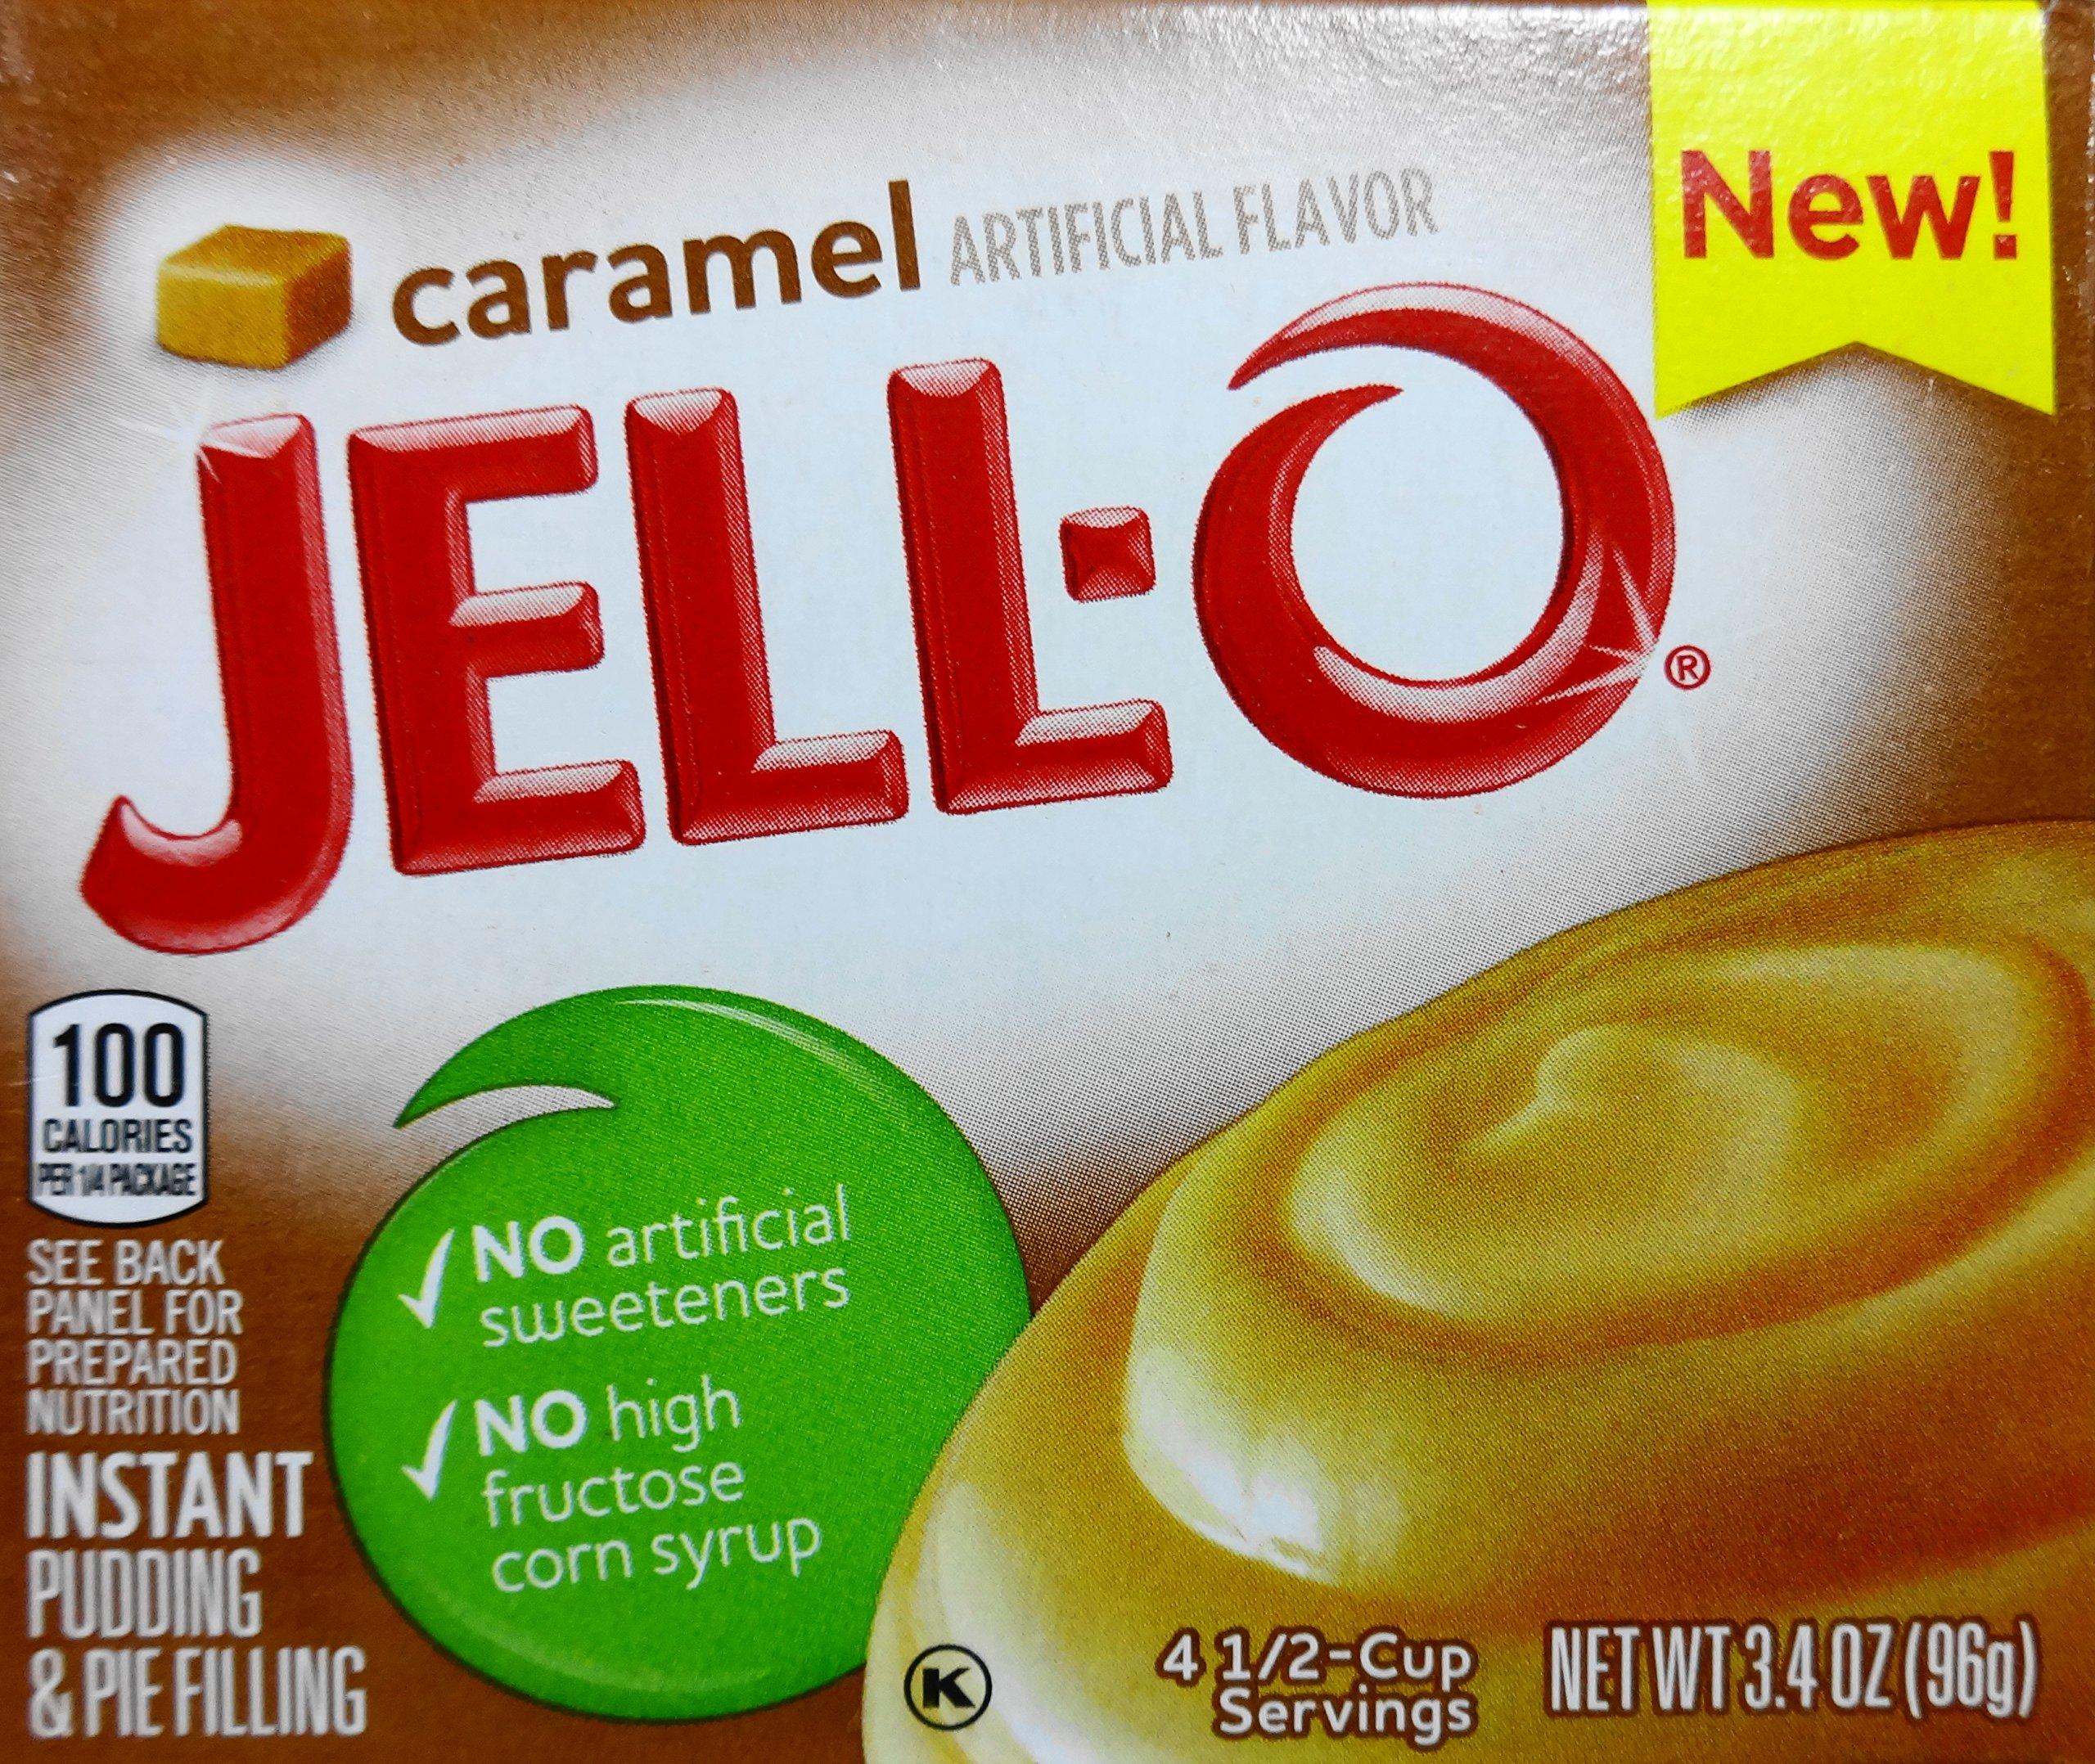 Jell-O Caramel Instant Pudding, 3.4 Oz (96g) (4 Pack)